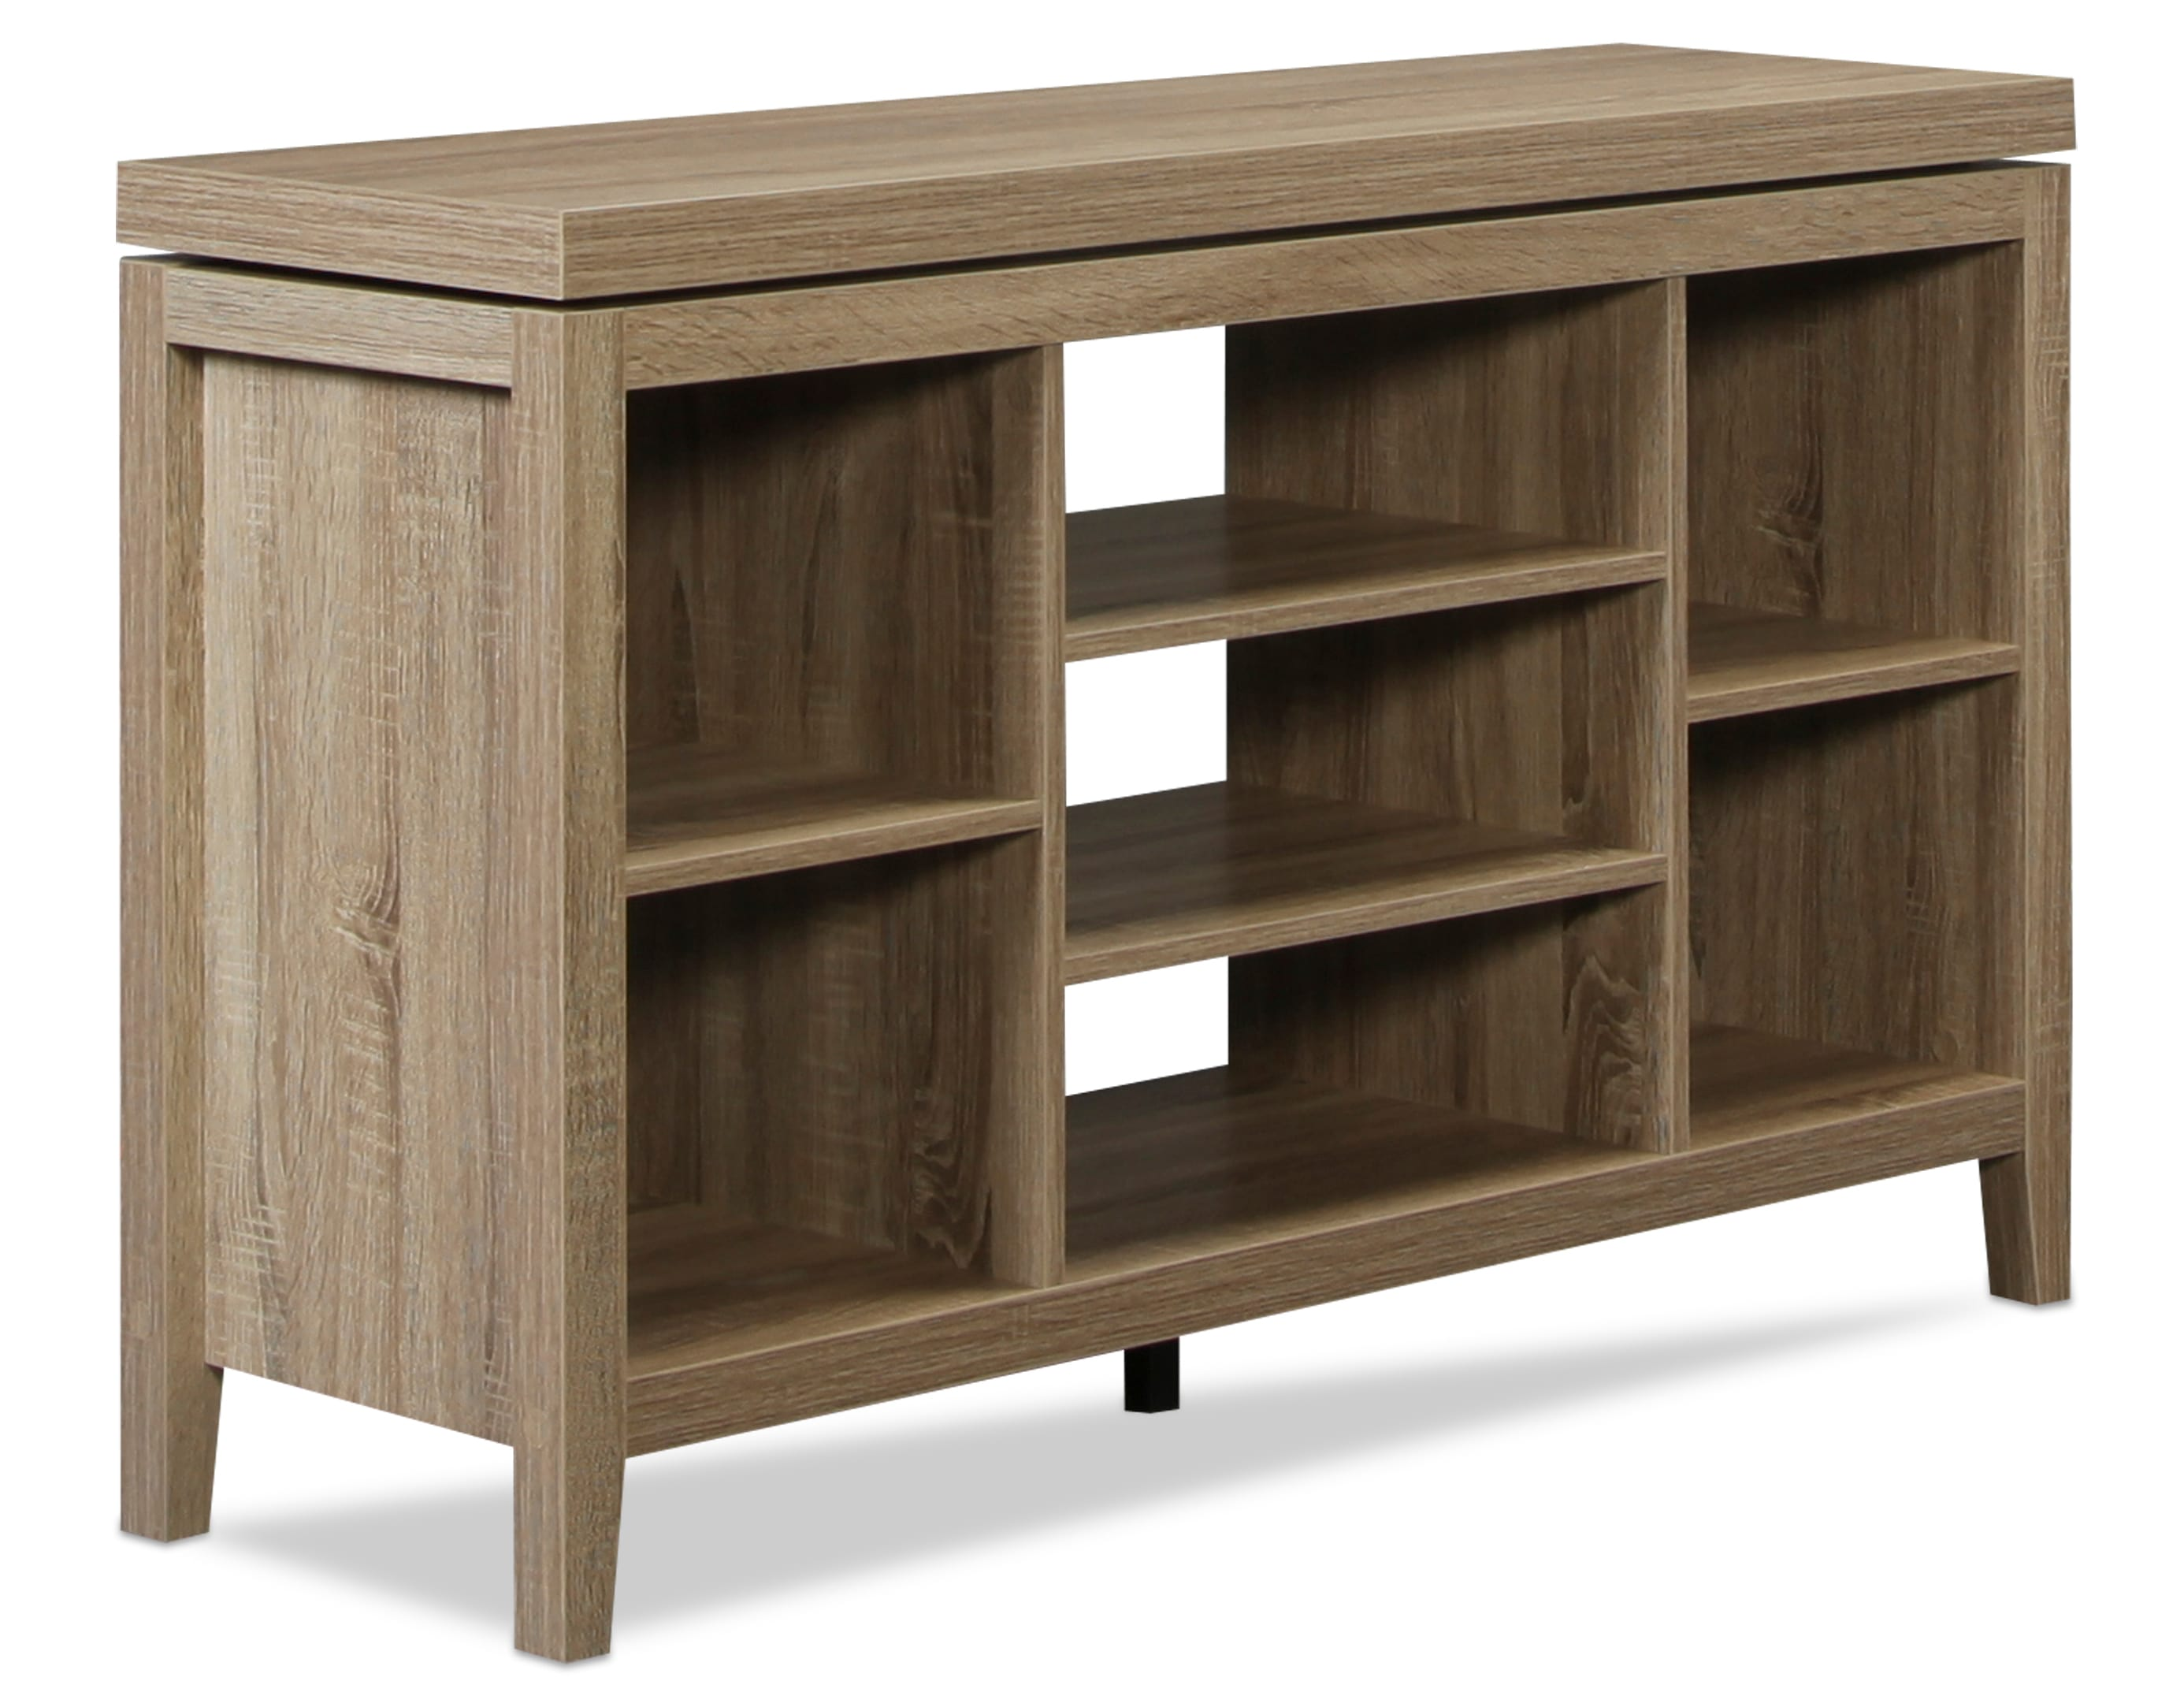 Audra TV Stand - Driftwood